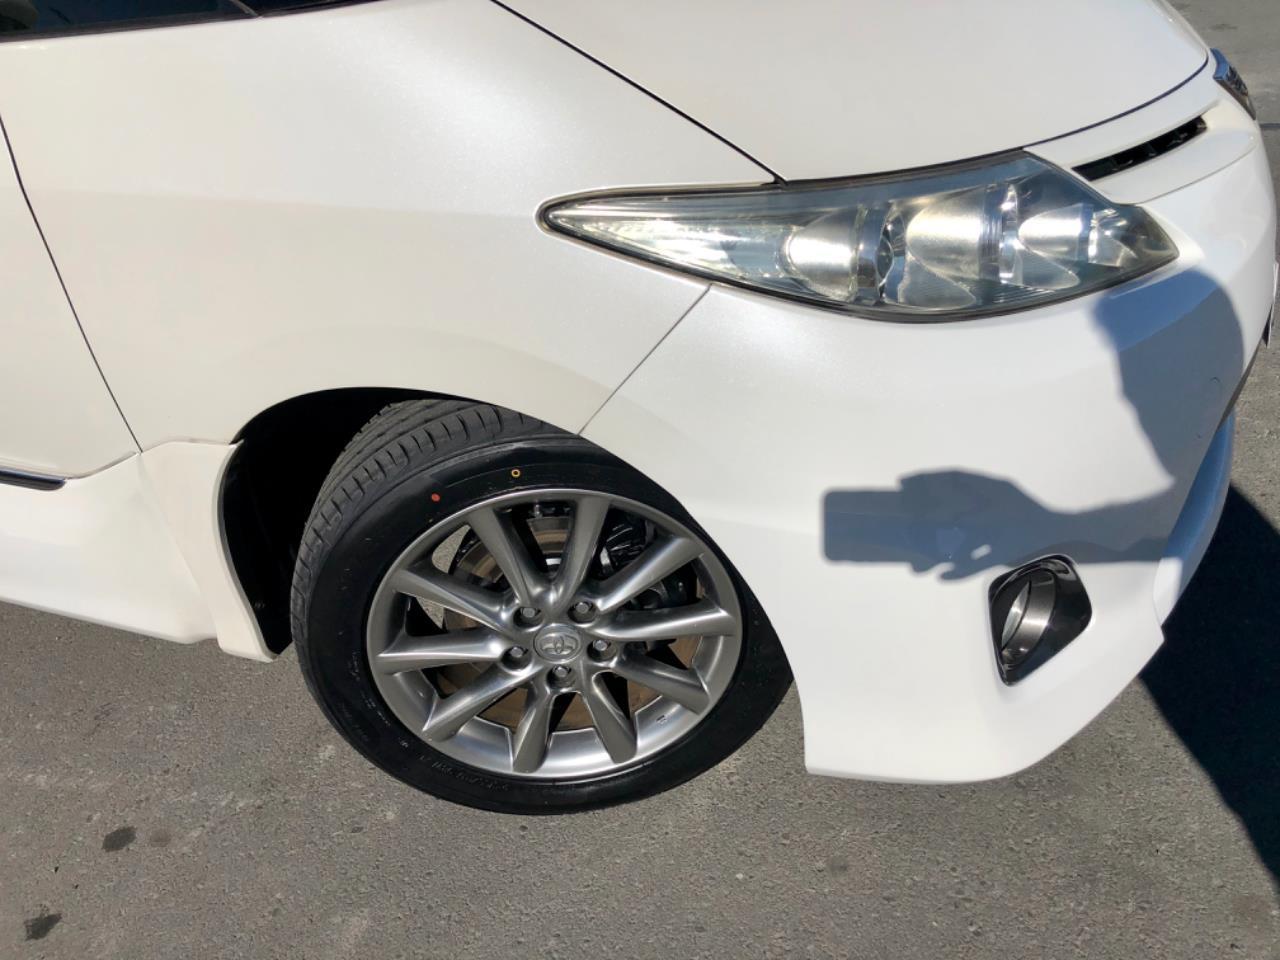 image-5, 2011 Toyota Estima Aeras 20th Anniversary Edition at Christchurch